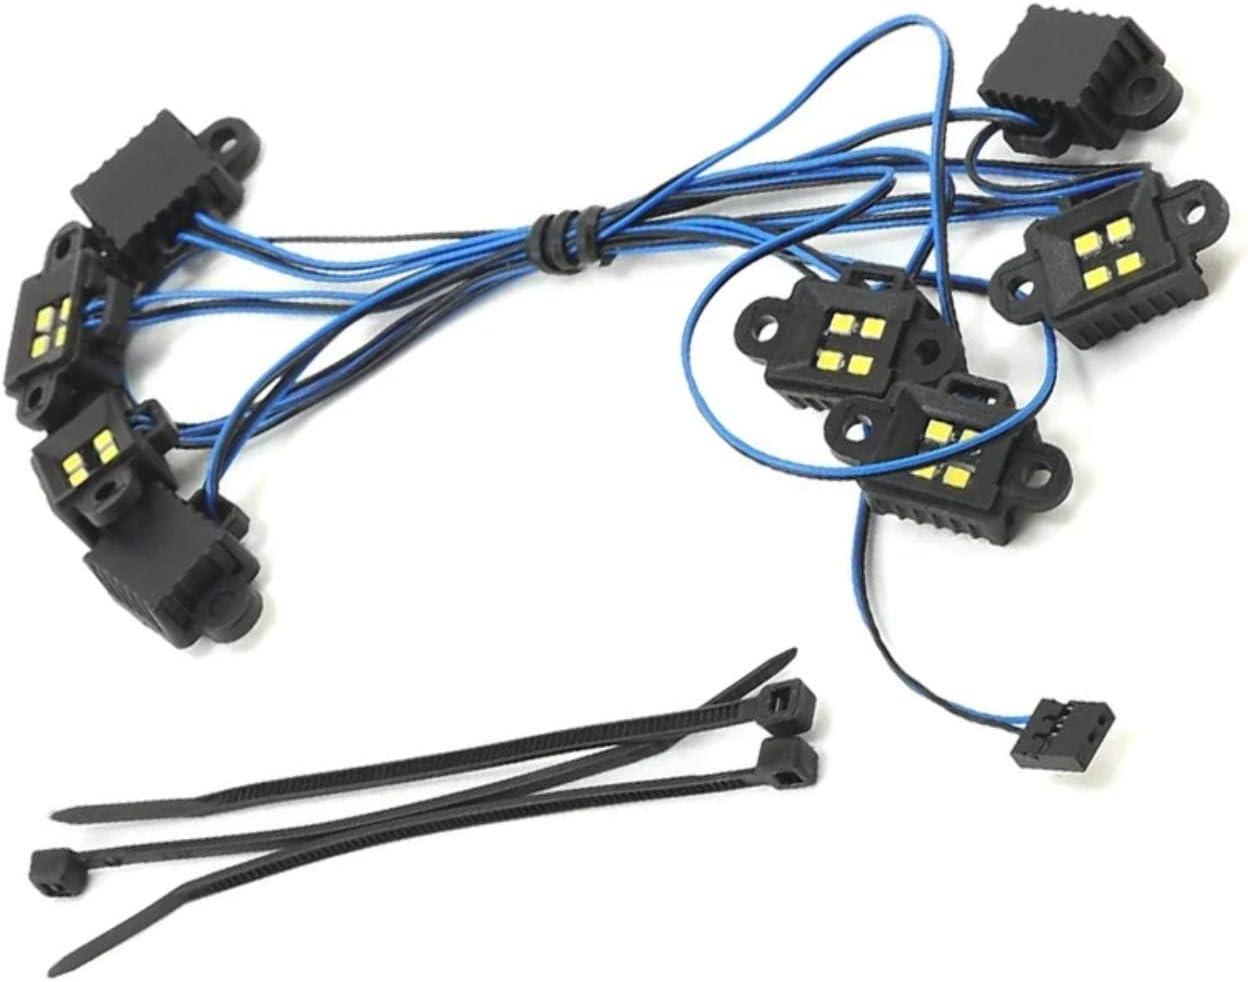 Traxxas 8026X LED Rock Light Kit and TRX-4 Req #8018 Choice #8 Ranking TOP8 #8028